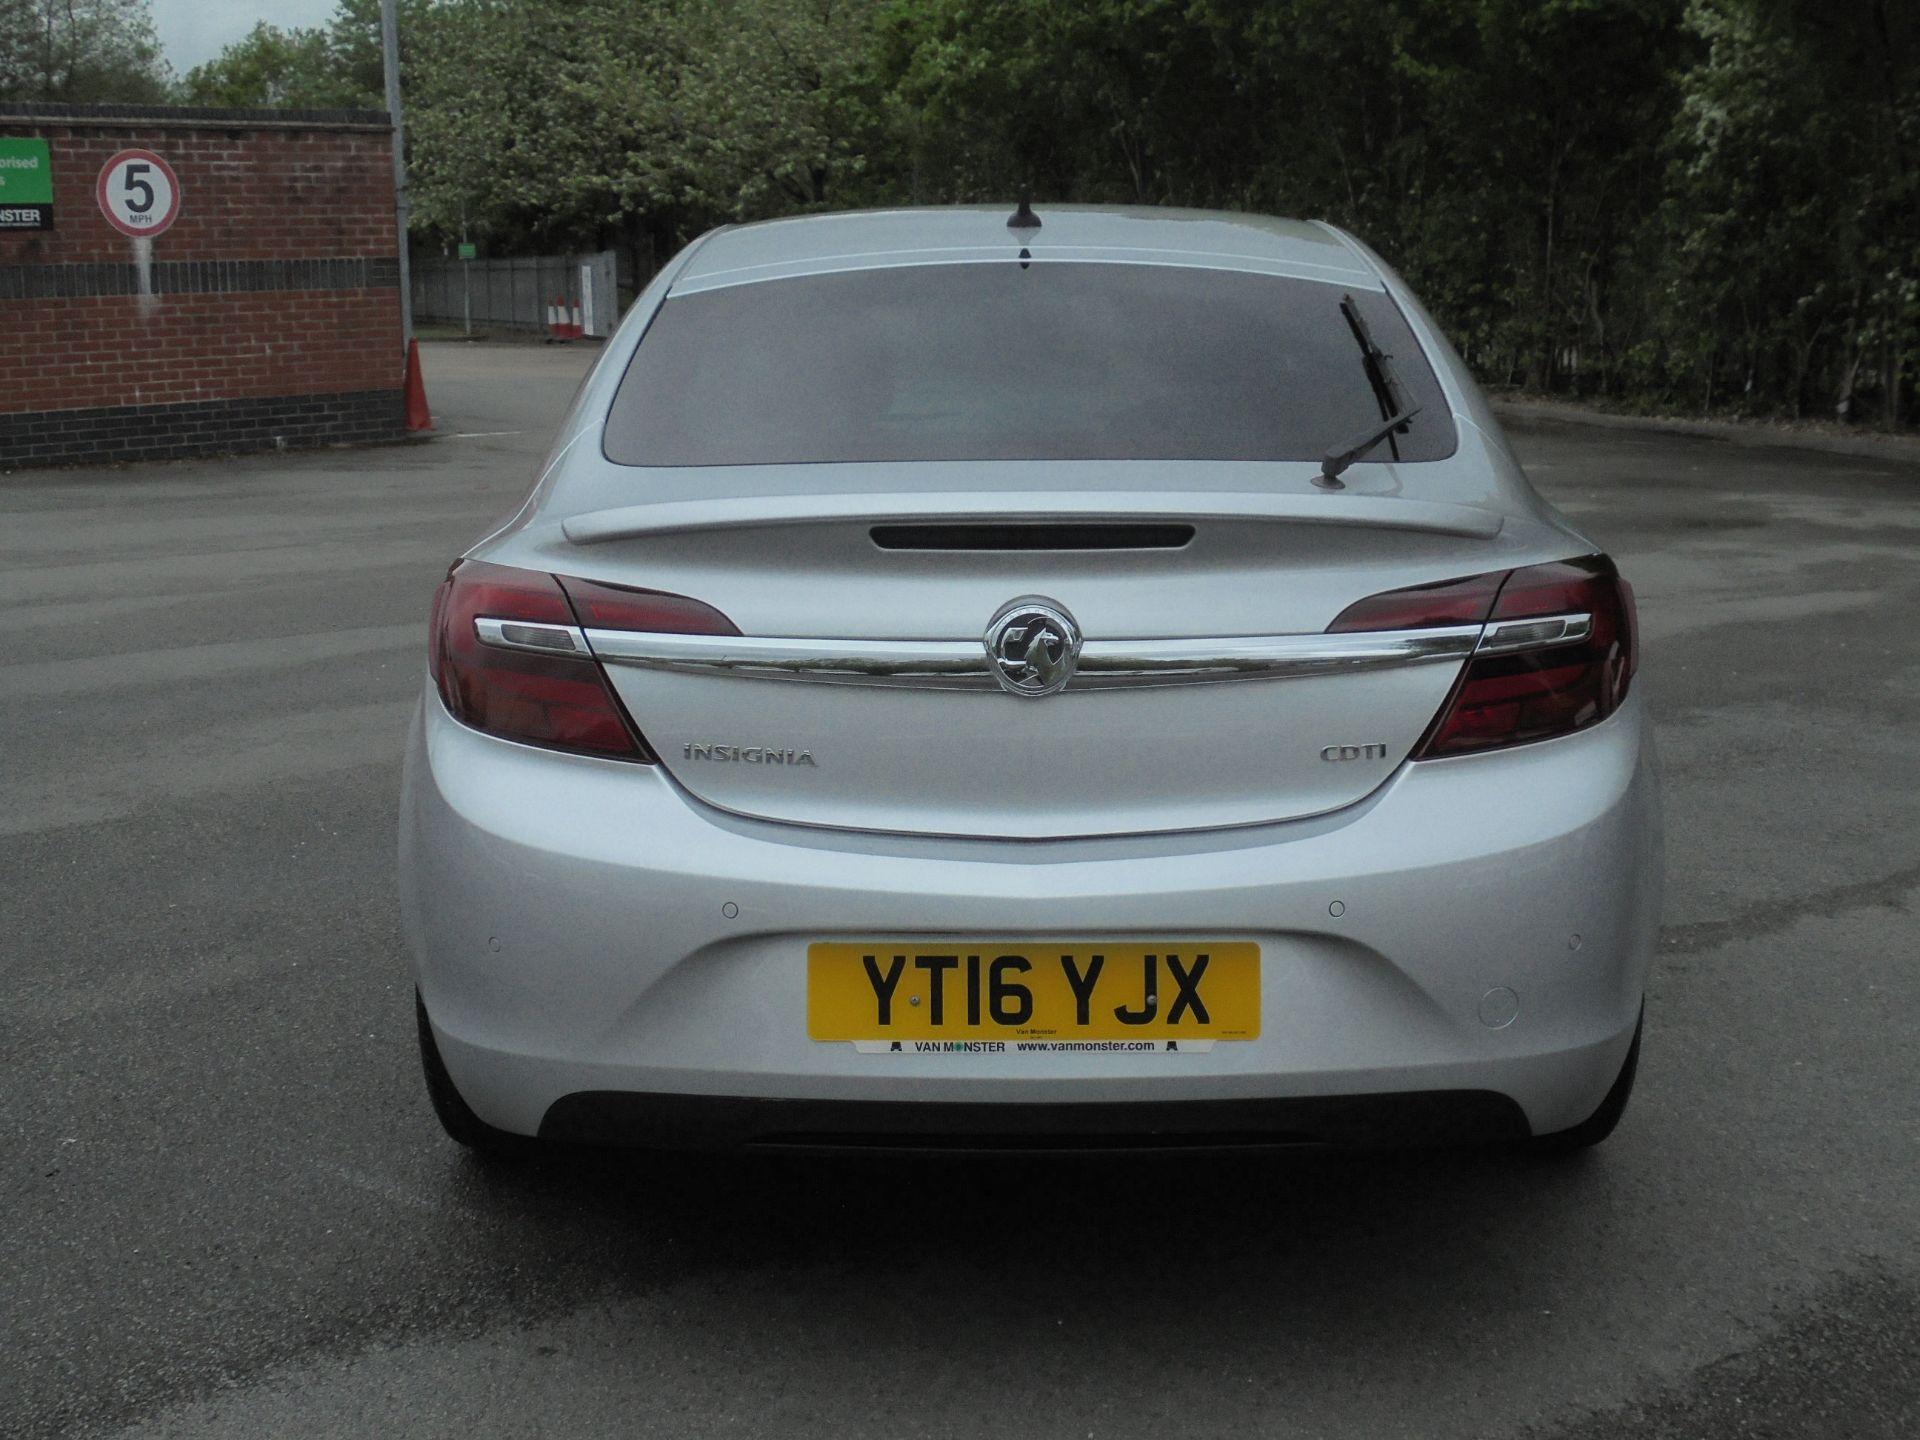 2016 Vauxhall Insignia 1.6 Cdti Sri Nav 5Dr [Start Stop] (YT16YJX) Image 7